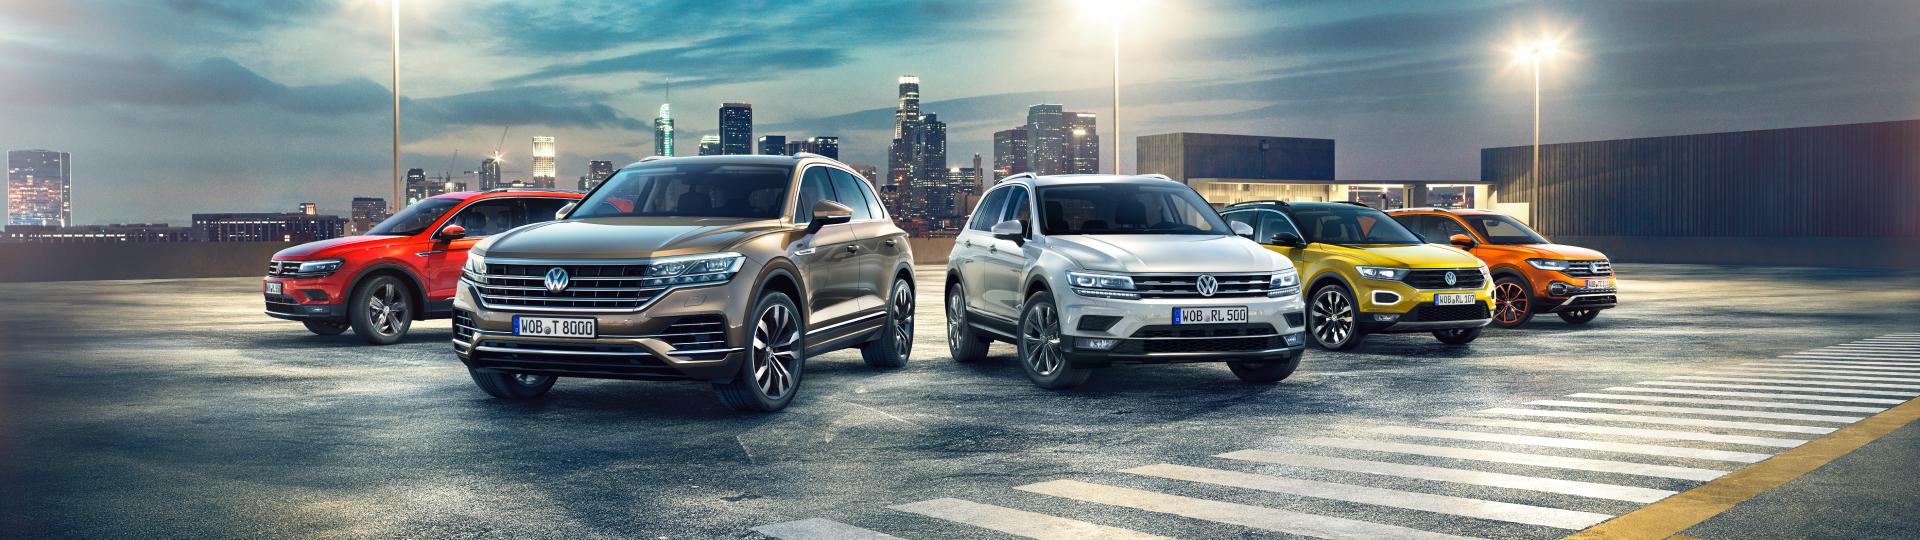 Volkswagen nuoma